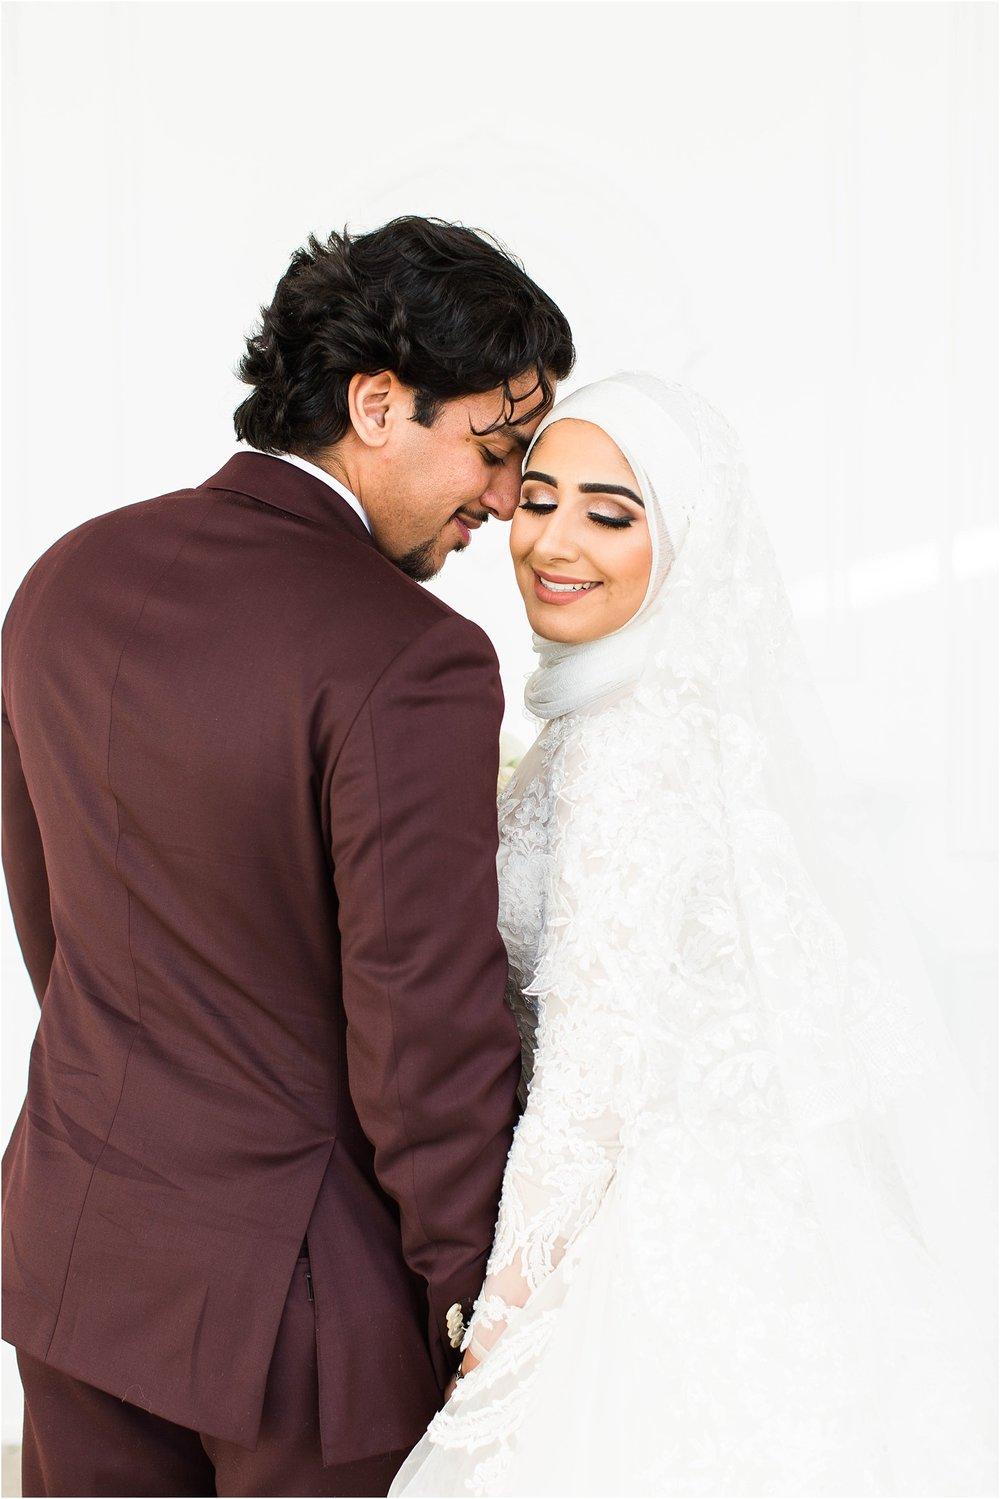 Red-Rose-Convention-Mint-Room-Wedding-Toronto-Mississauga-Brampton-Scarborough-GTA-Pakistani-Indian-Wedding-Engagement-Photographer-Photography_0115.jpg